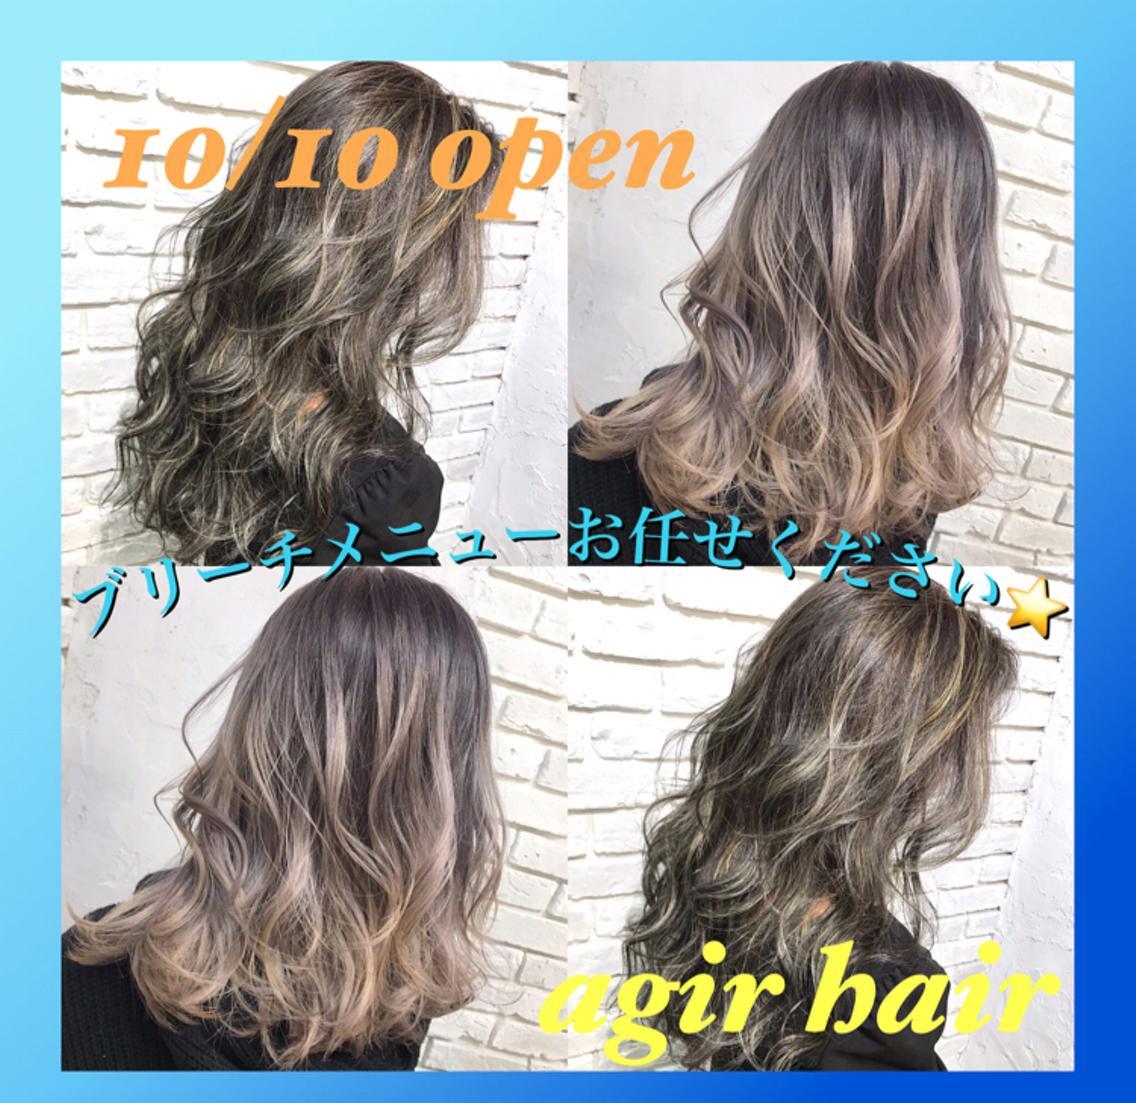 agir hair 上野店所属・⭐️店長✂︎山本昌貴⭐️の掲載